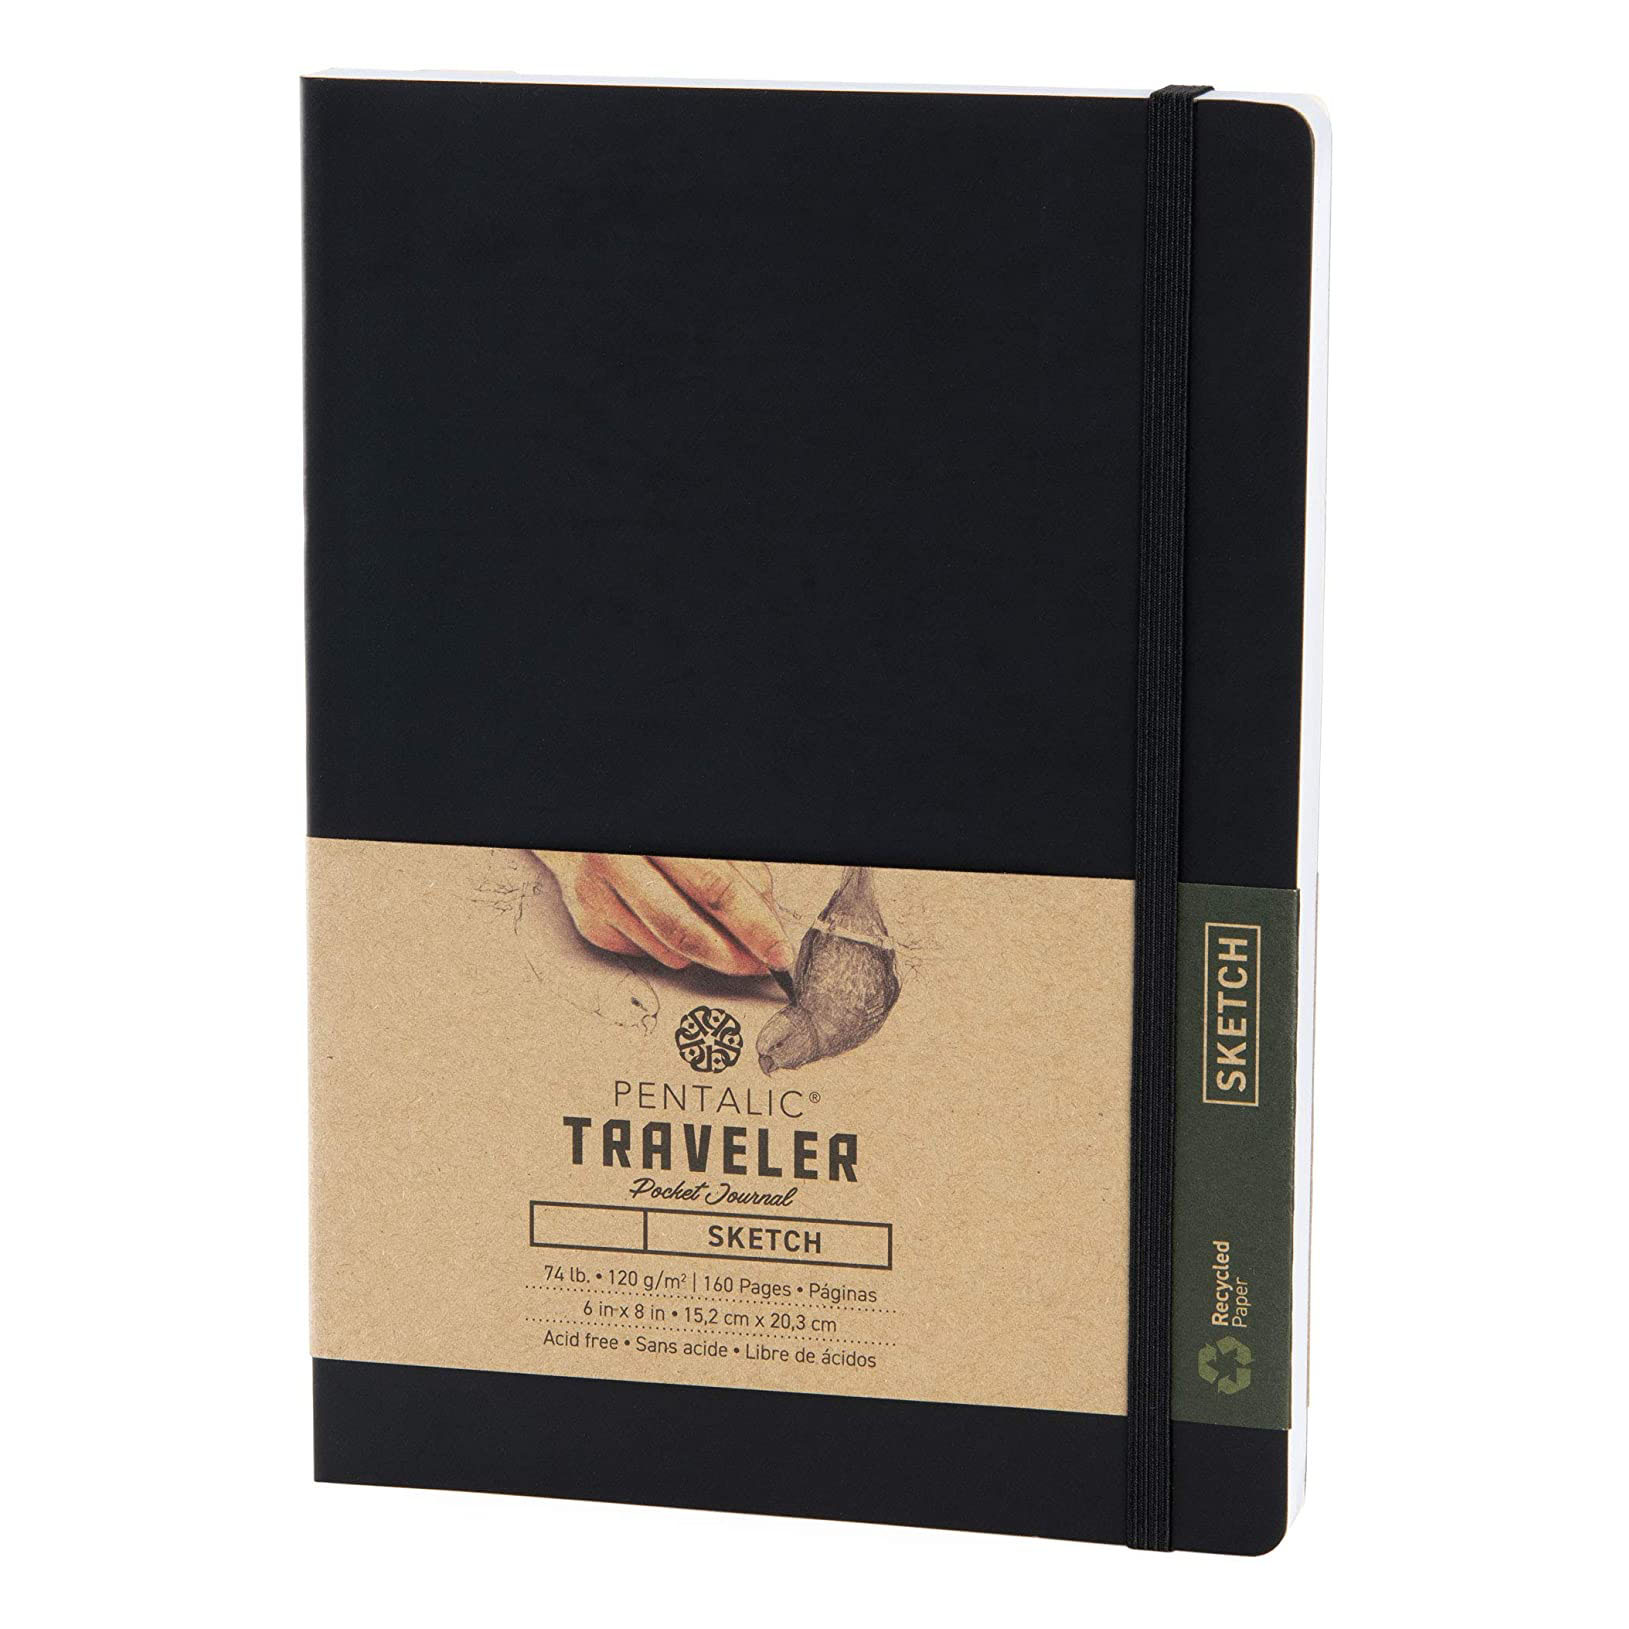 Pentalic Traveler Pocket Journal Sketch